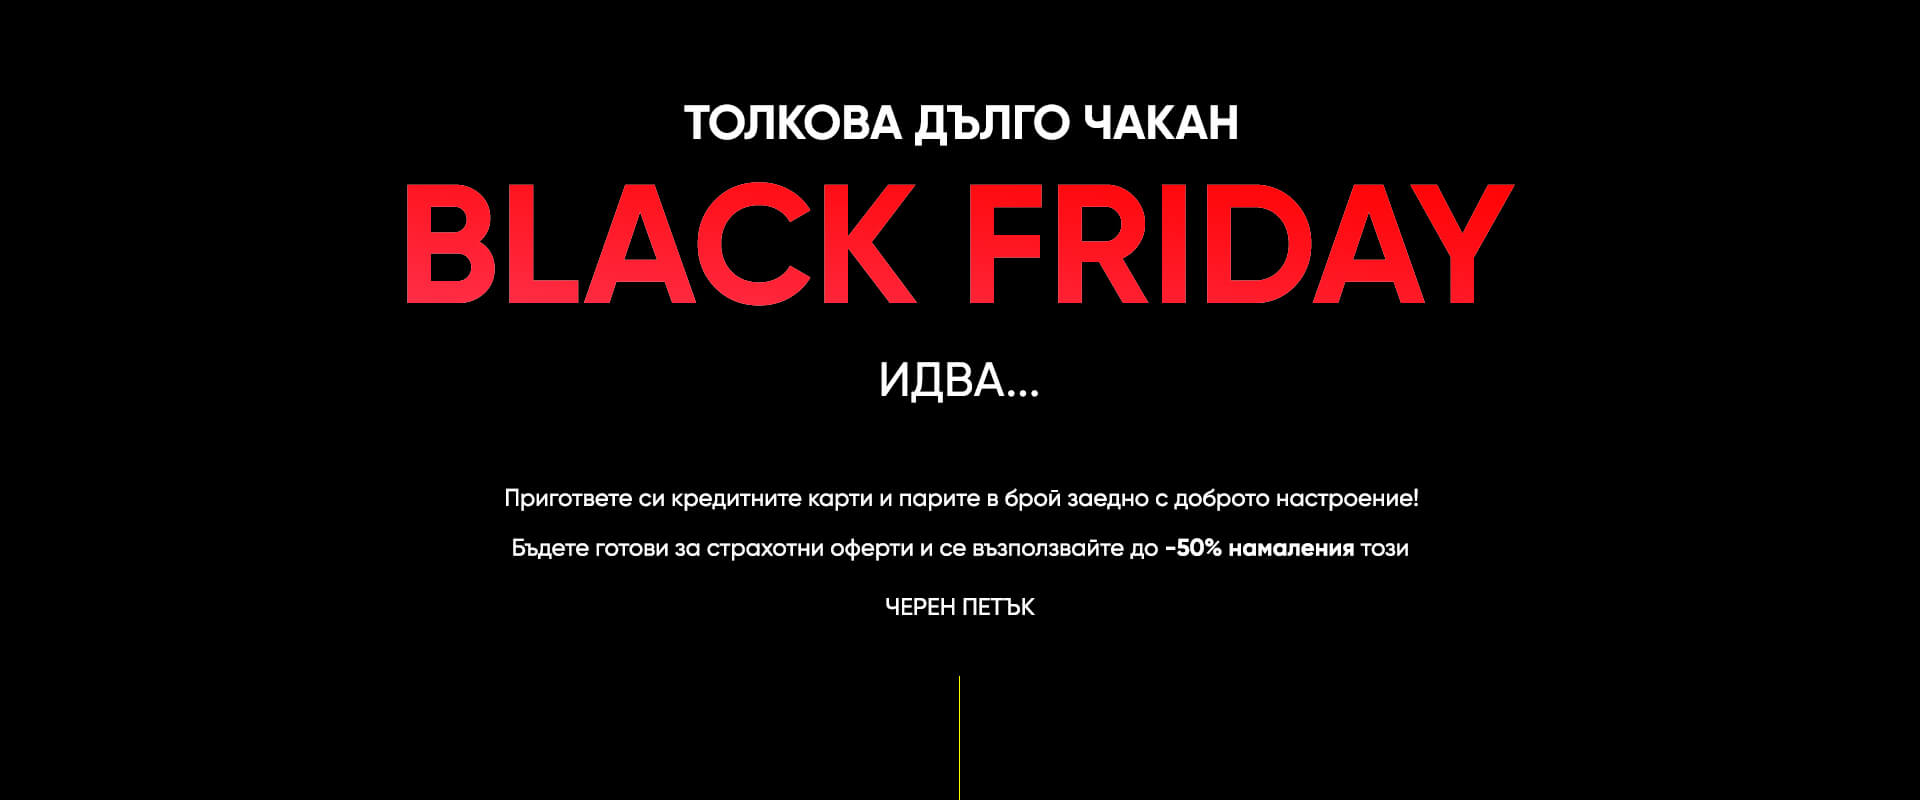 Мултимаск черен петък